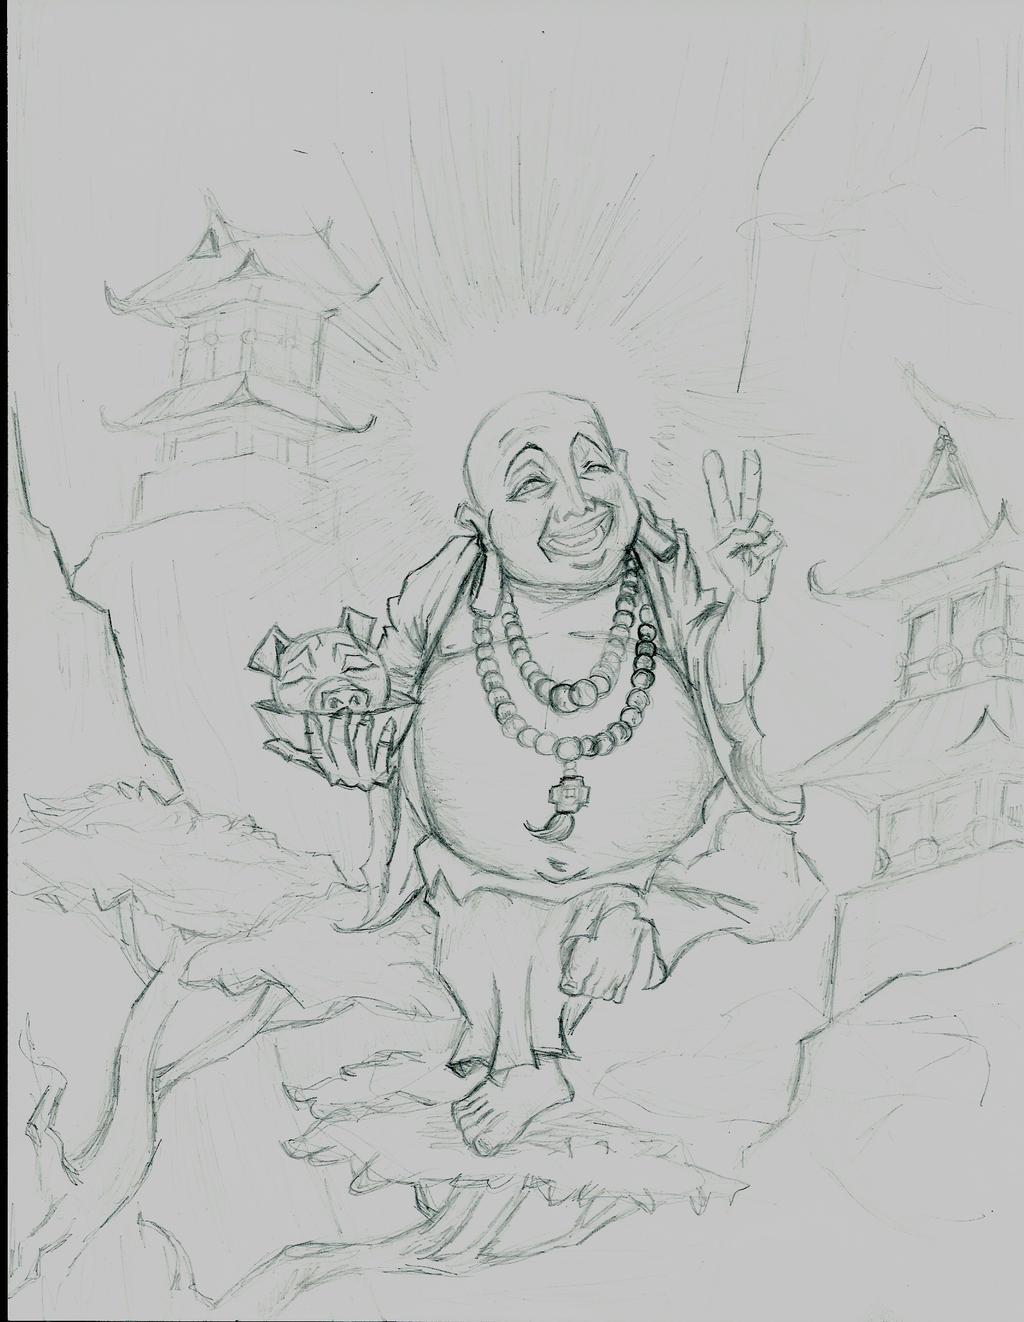 Fat buddha by jeyyeah on DeviantArt